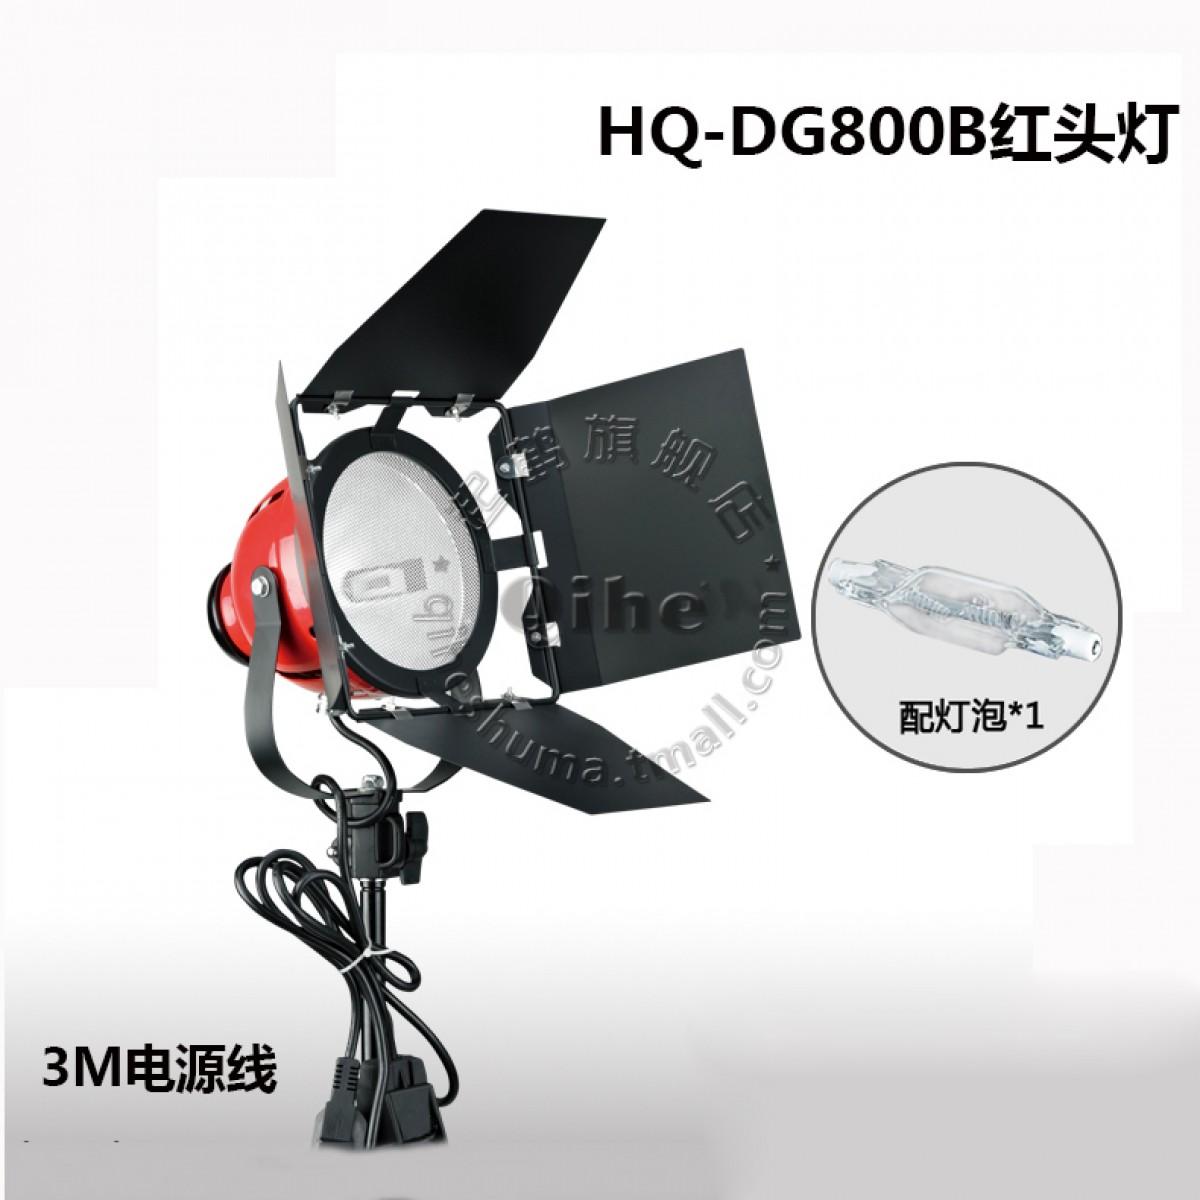 Qihe 起鹤牌 DG800B 红头灯 调焦柔光灯 影视灯